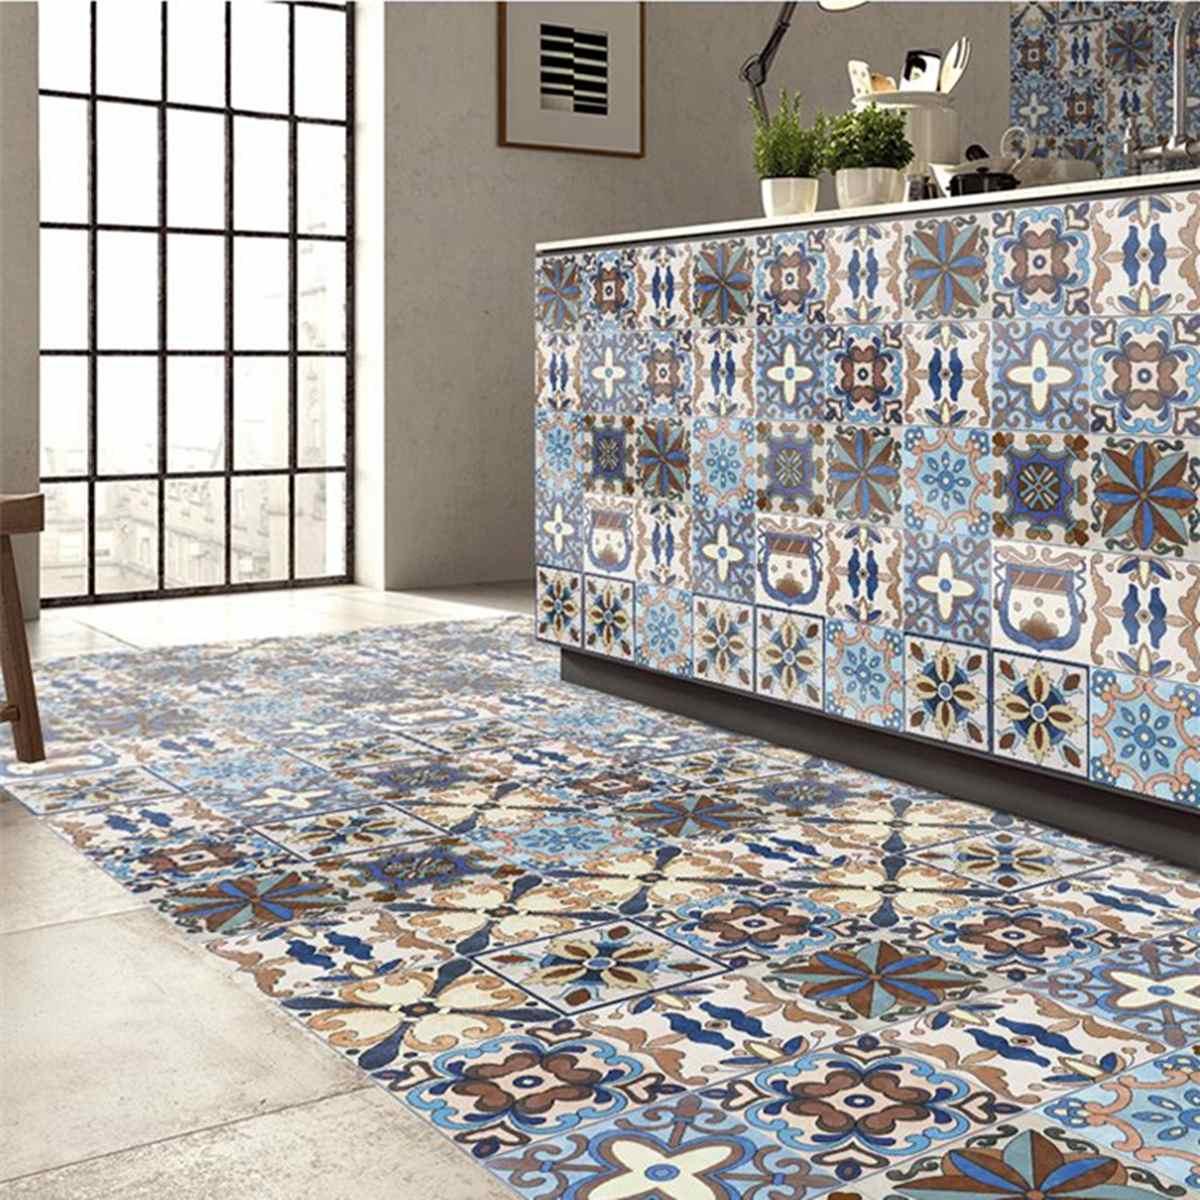 5M PVC Self Adhesive Tiles Floor Wall Stickers Mosaics Art Decal Waterproof Kitchen Home Room DIY Decoration Flowers Murals